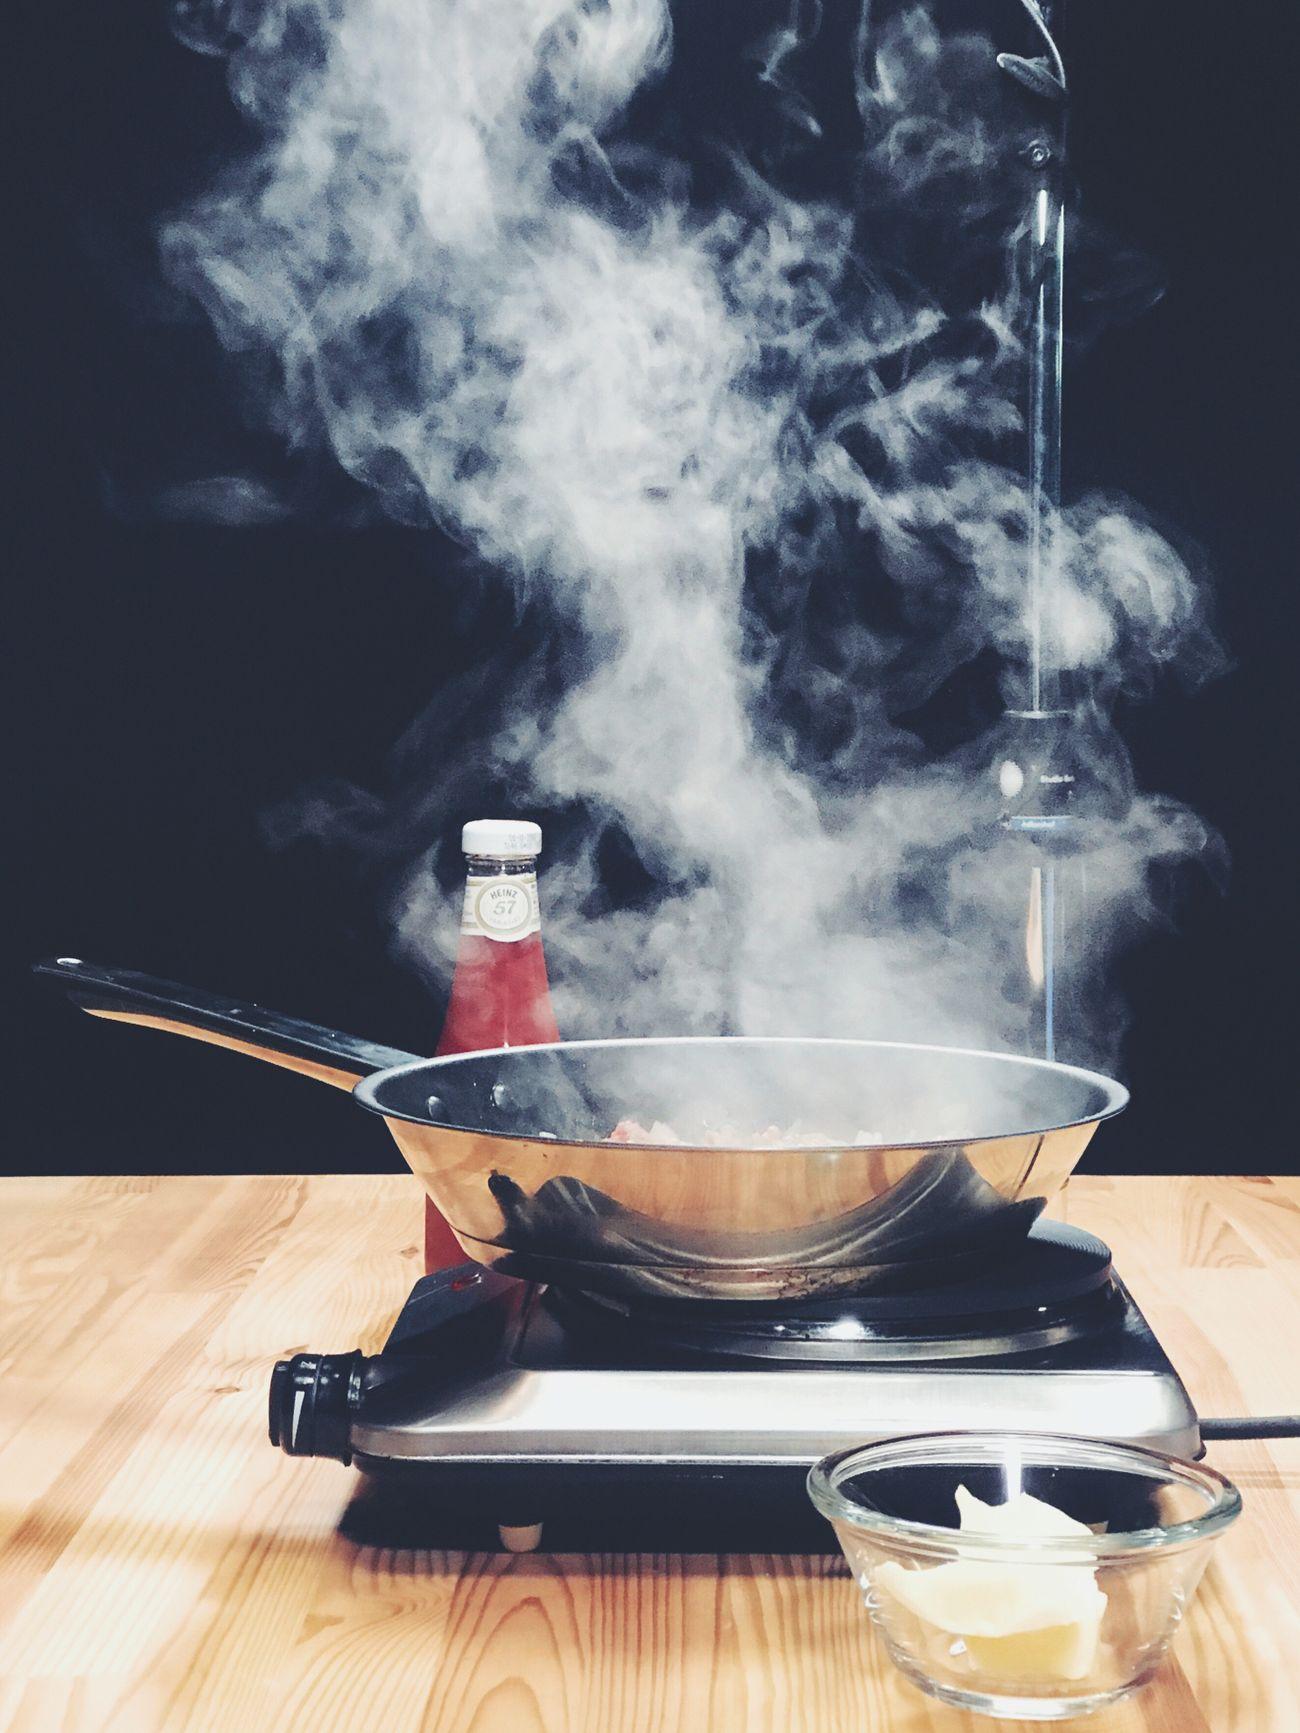 Heat - Temperature Smoke - Physical Structure Futtern Kochen Cooking Heinz Ketchup